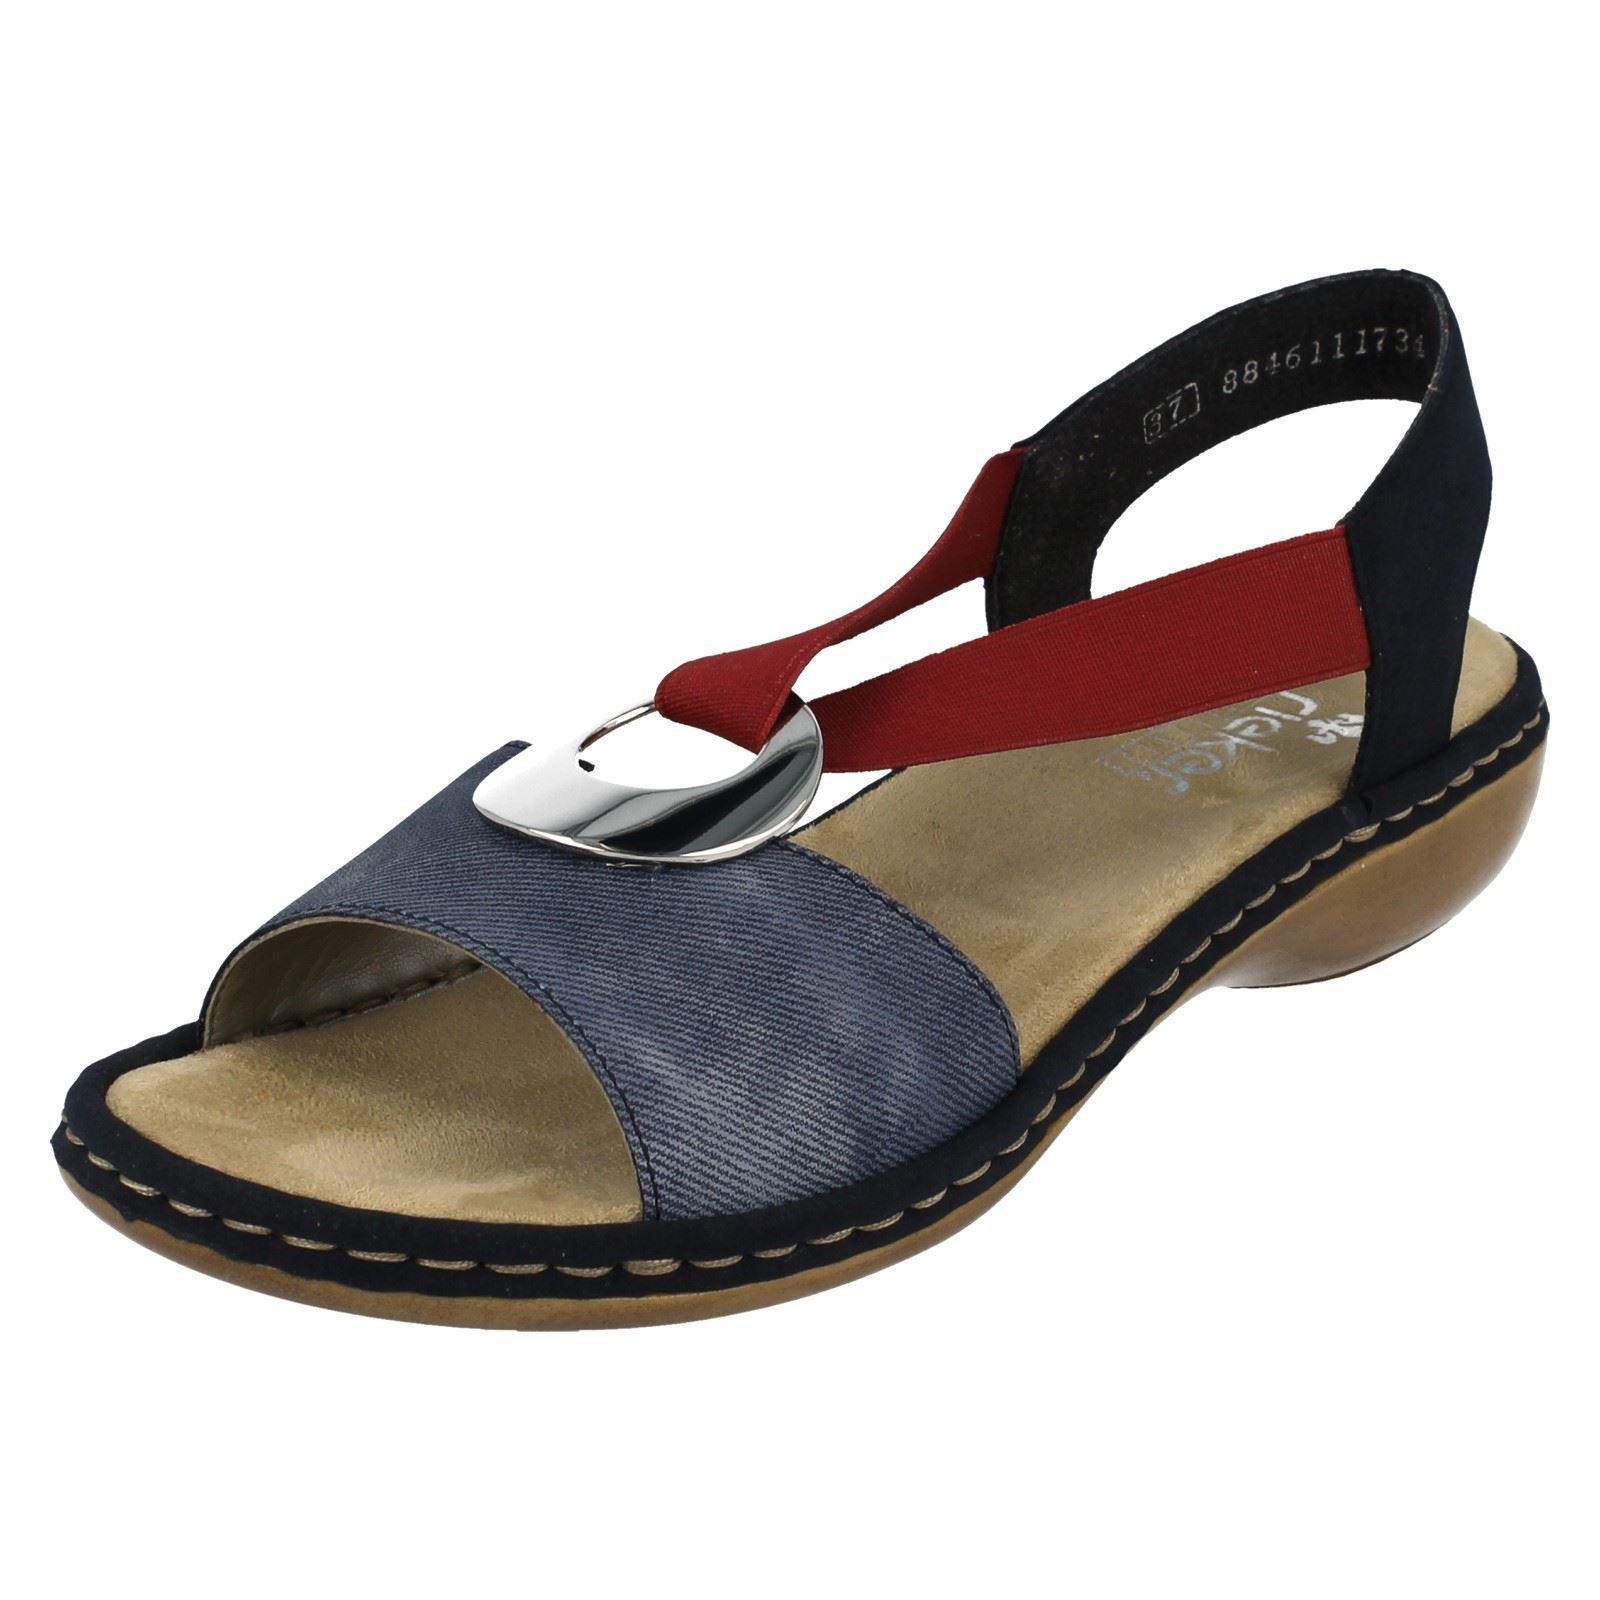 Ladies blu sandali Rieker blu 659q9 combinazione ArvOxAT